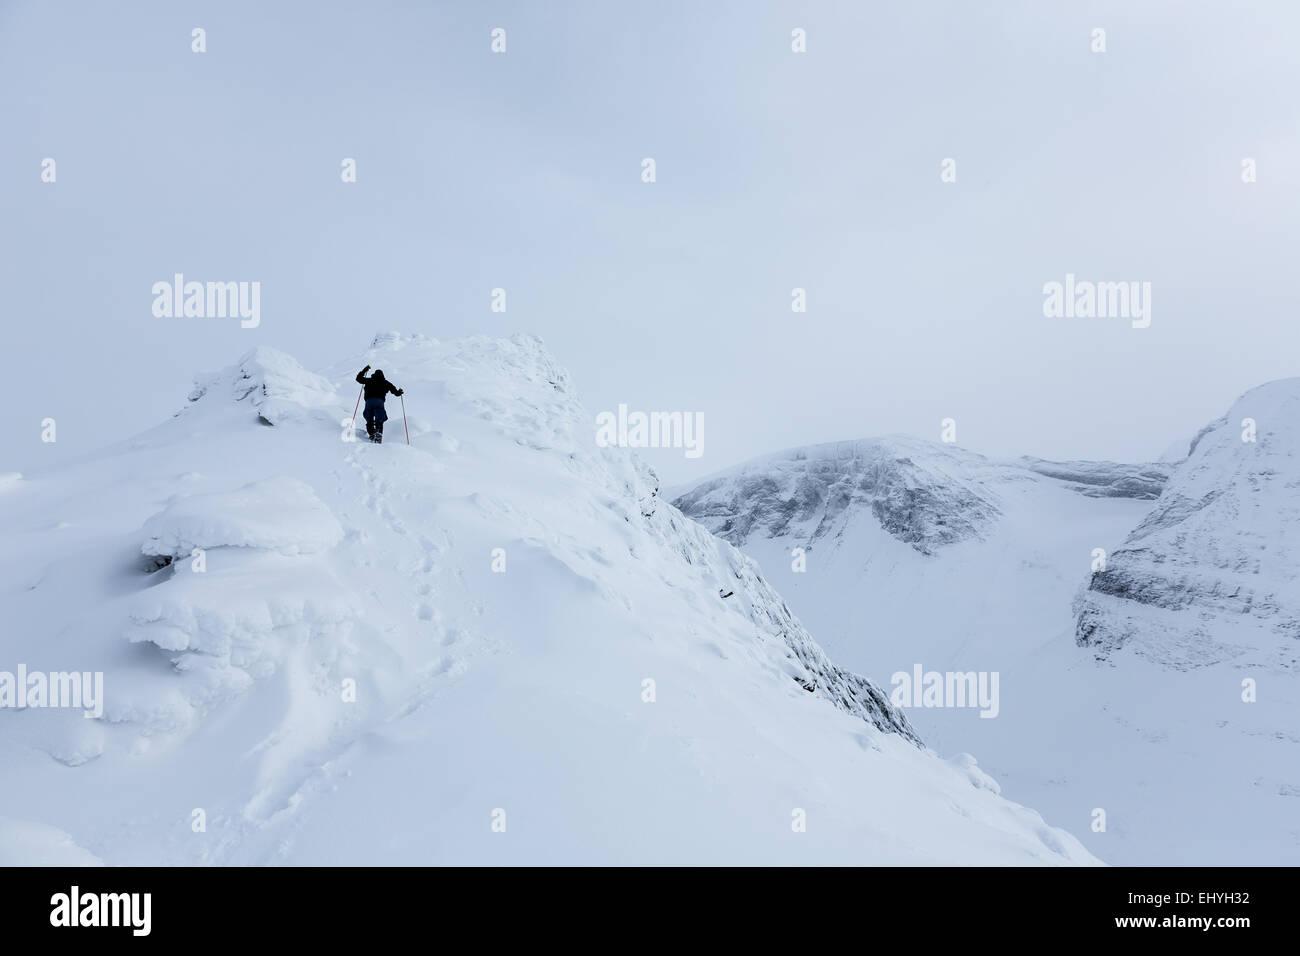 Nallostugan, Kebnekaise mountain area, Kiruna, Sweden, Europe, EU - Stock Image